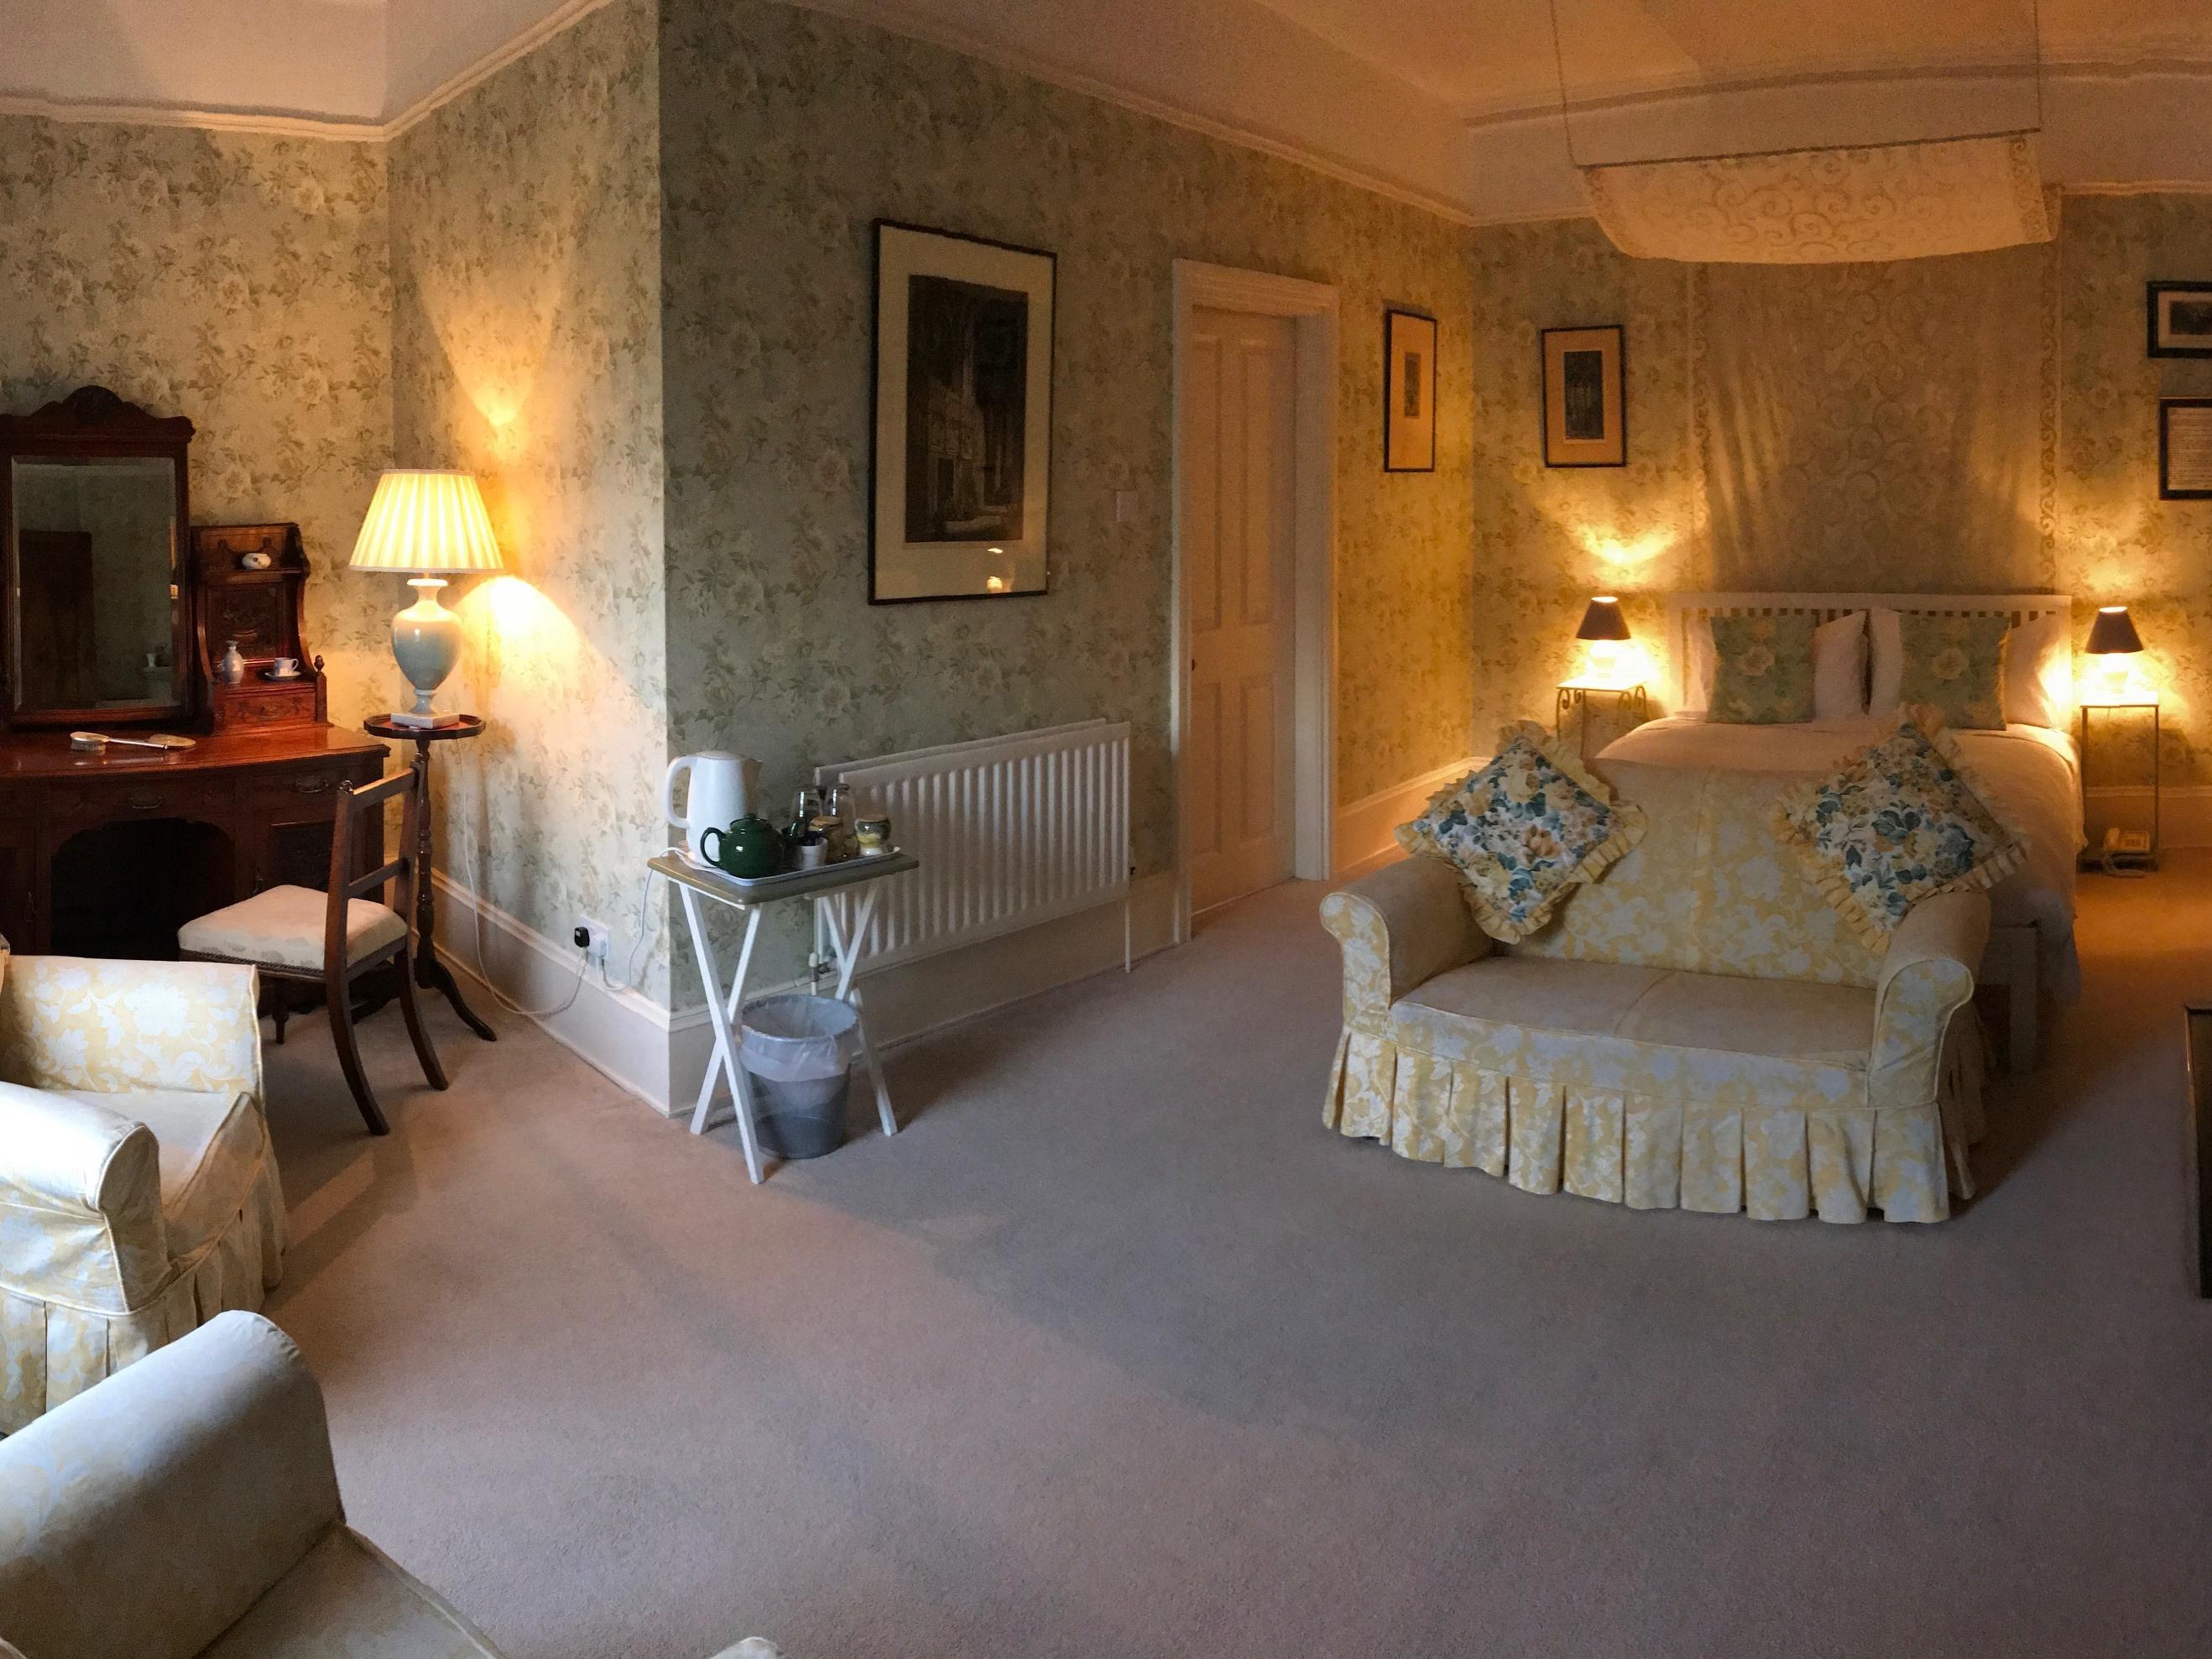 The Chintz Room